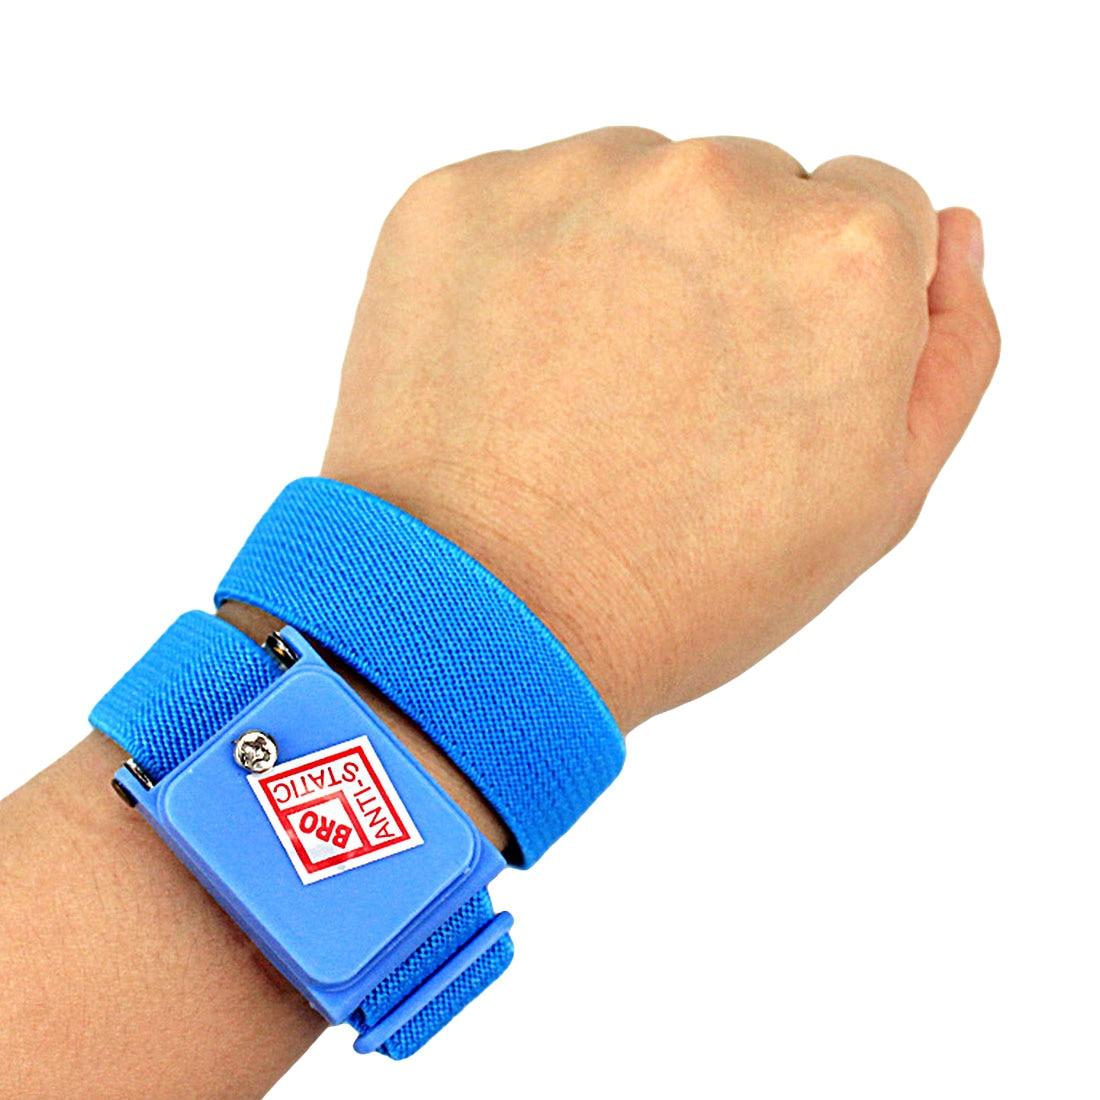 Good Esd Anti Static Cordless Wrist Strap Elastic Band For Sensitive Electronics Repair Tools Cheap Sales 50% Hand Tool Sets Tool Sets